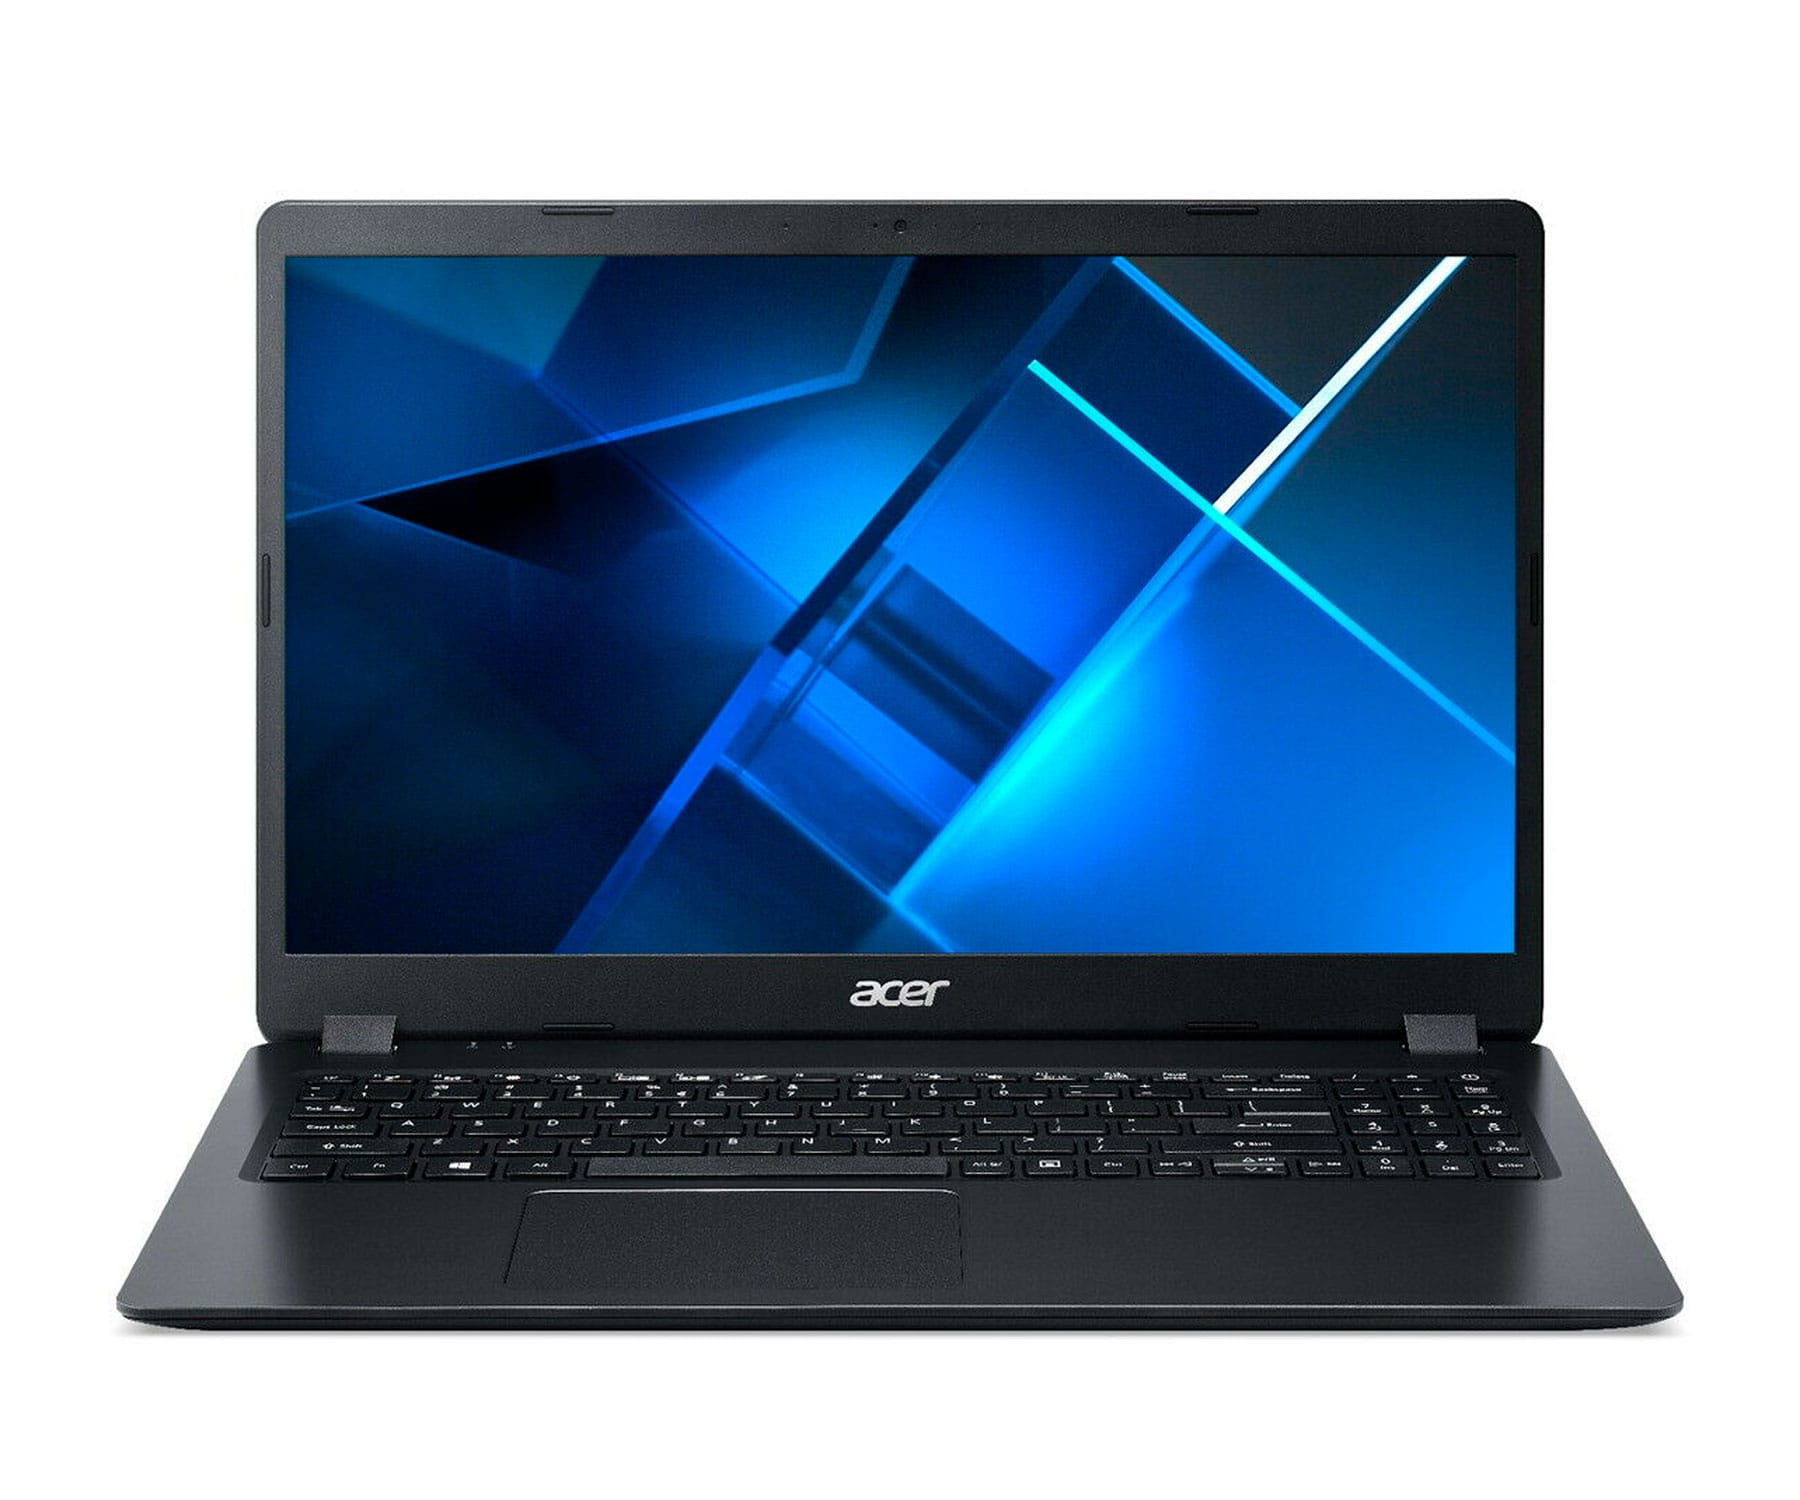 ACER  EXTENSA 15 215-52-37Y7 NEGRO PORTÁTIL 15.6'' FHD i3-1005G1 256GB SSD 8GB RAM FREEDOS